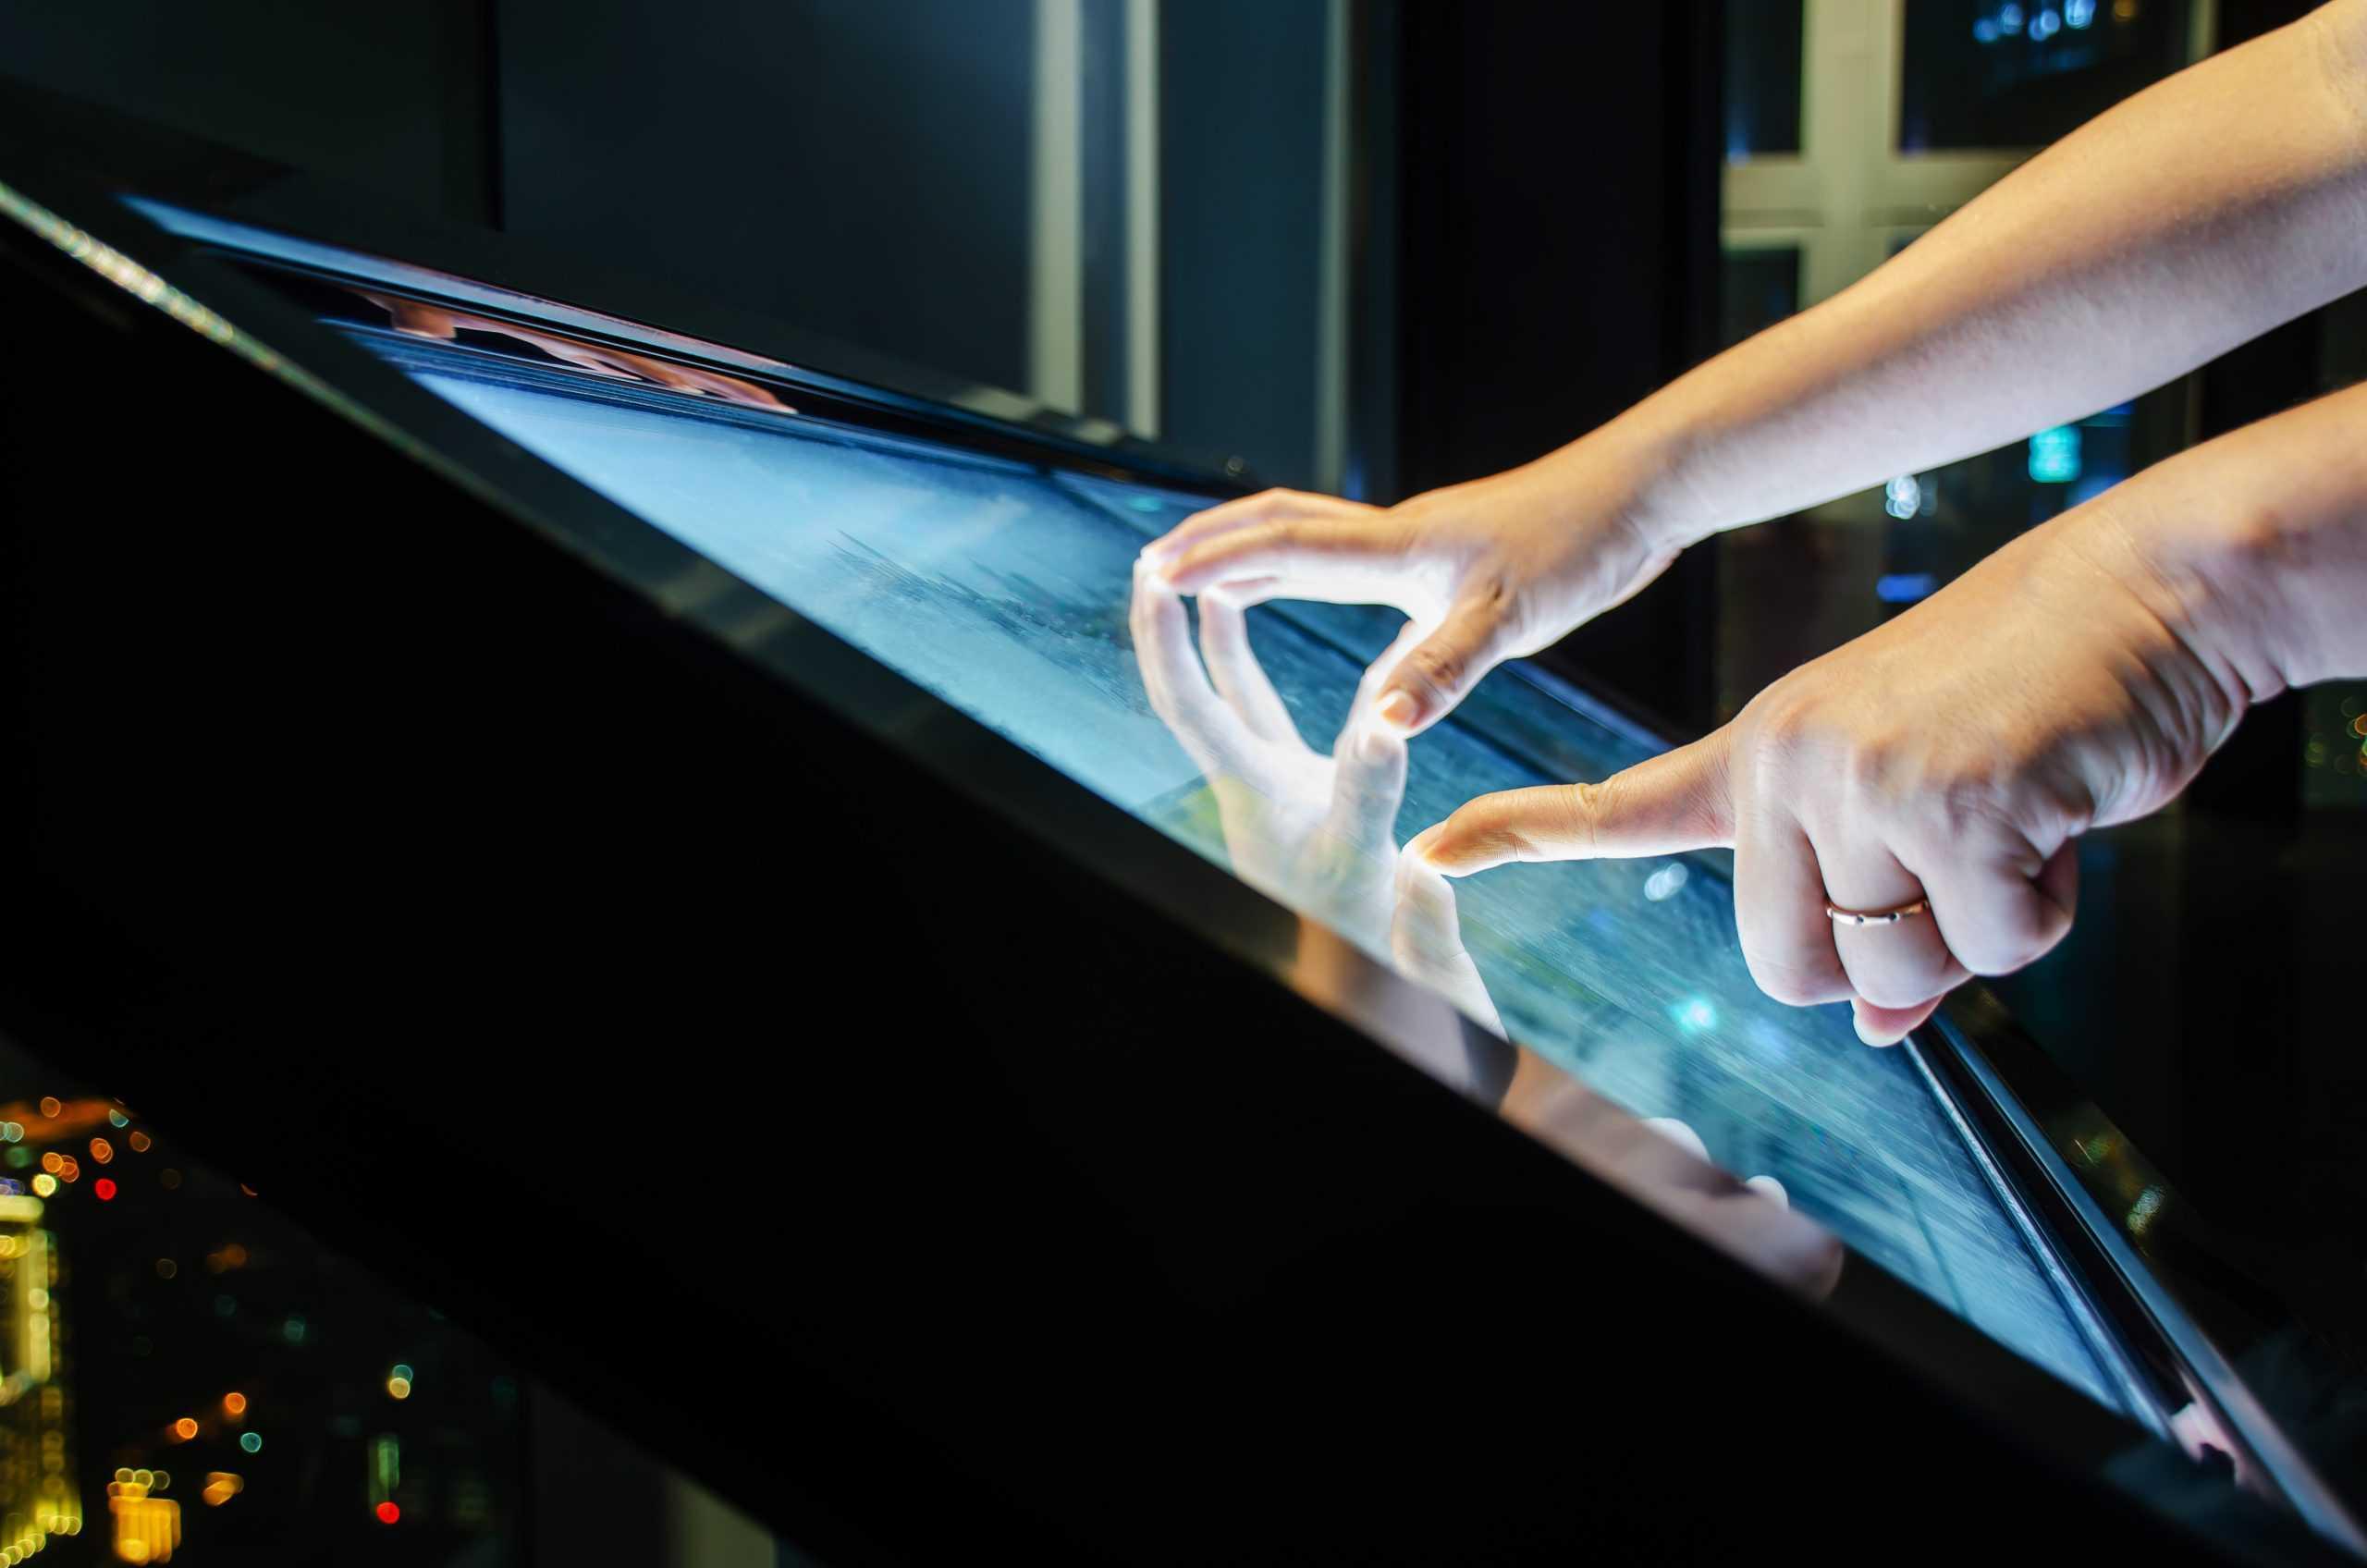 Custom LCD display